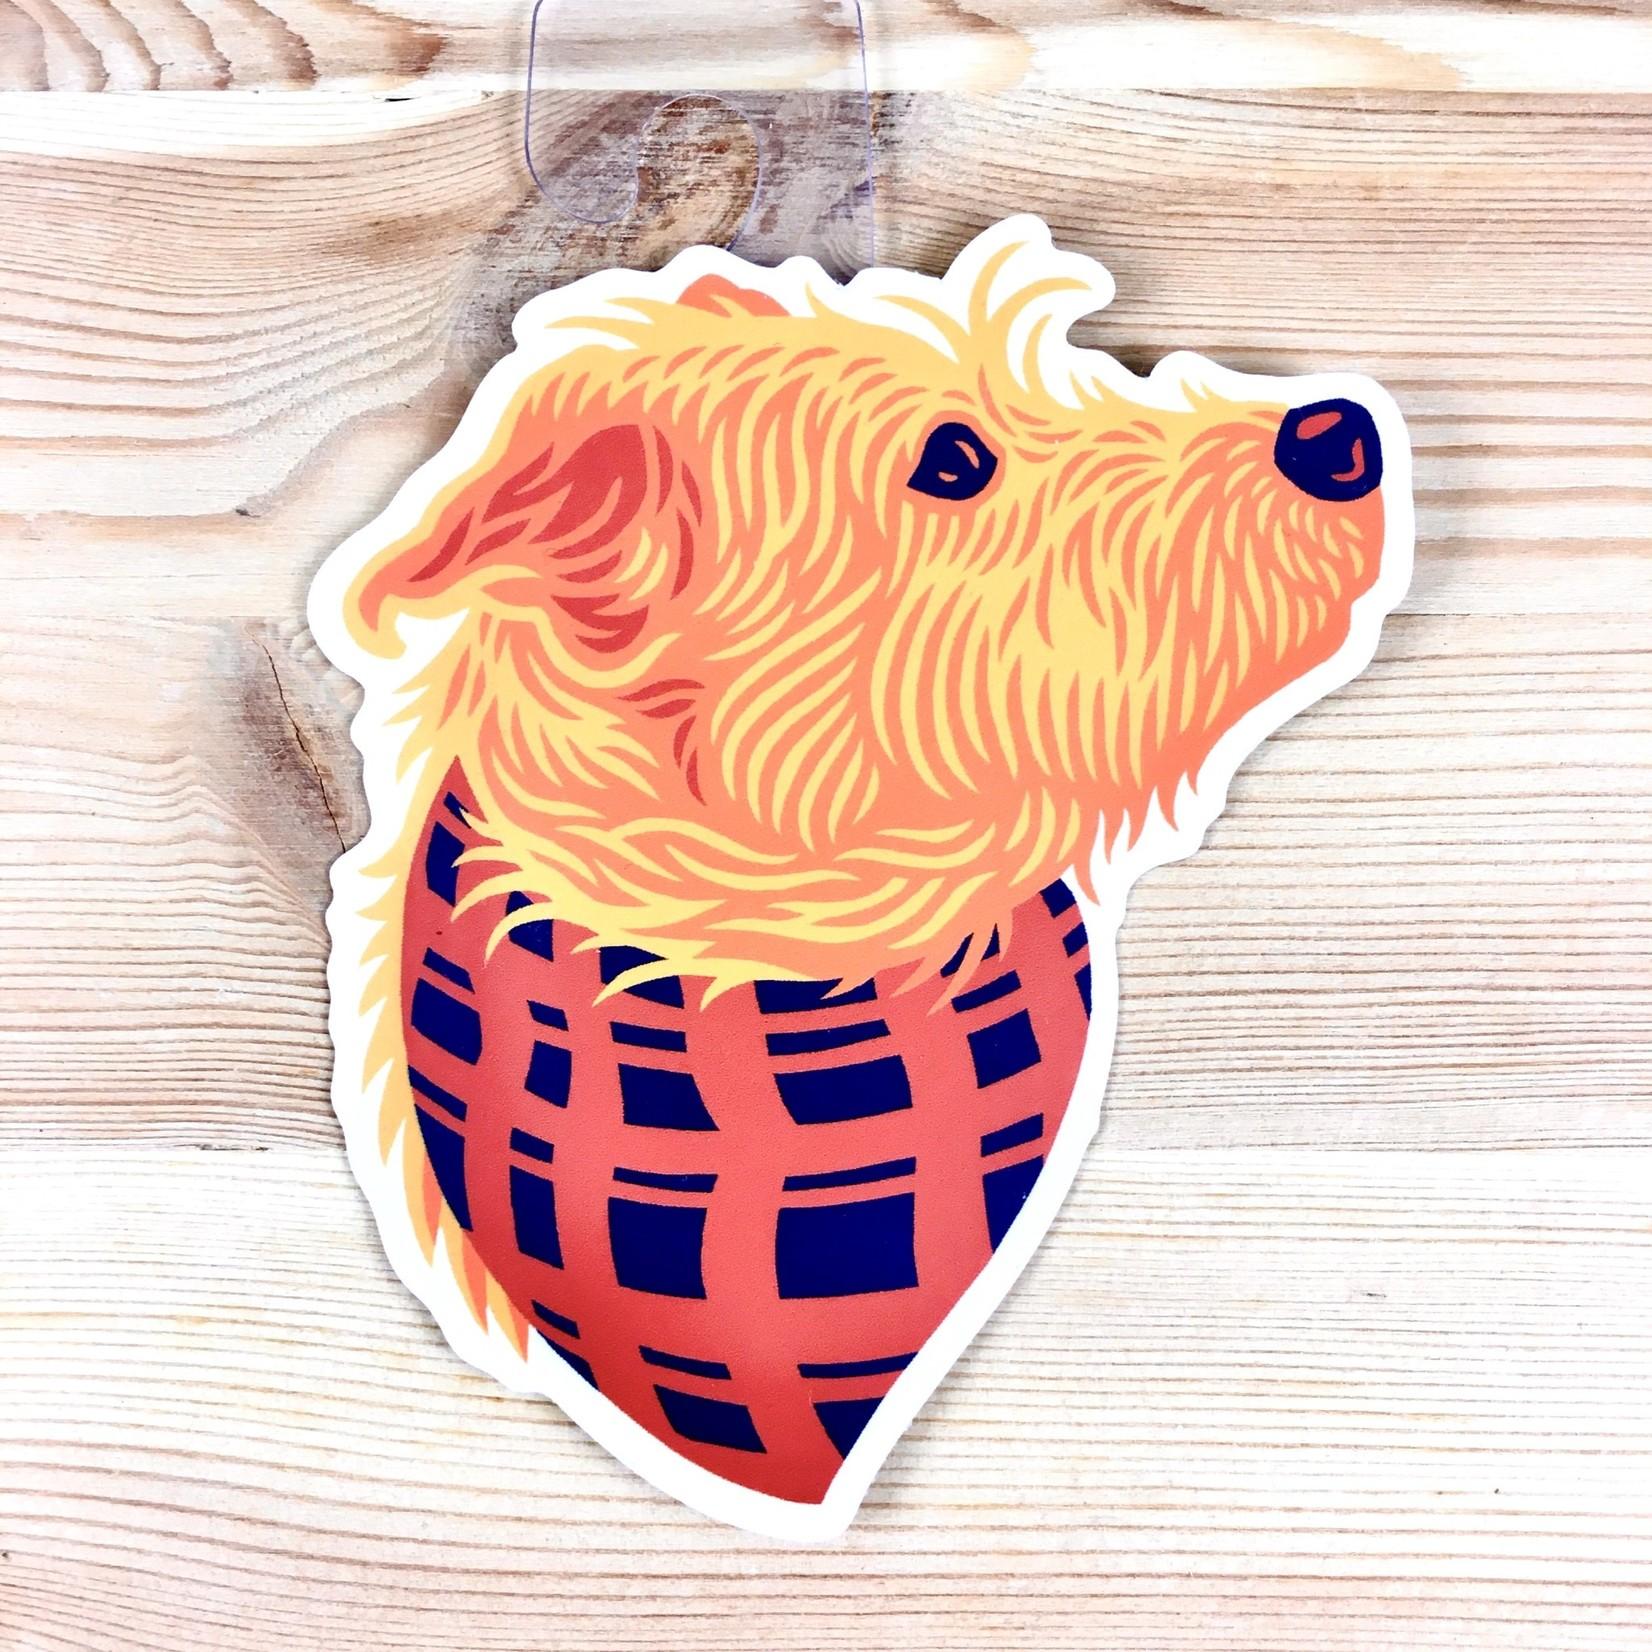 John Vogl / The Bungaloo Loki Bandana Dog Sticker